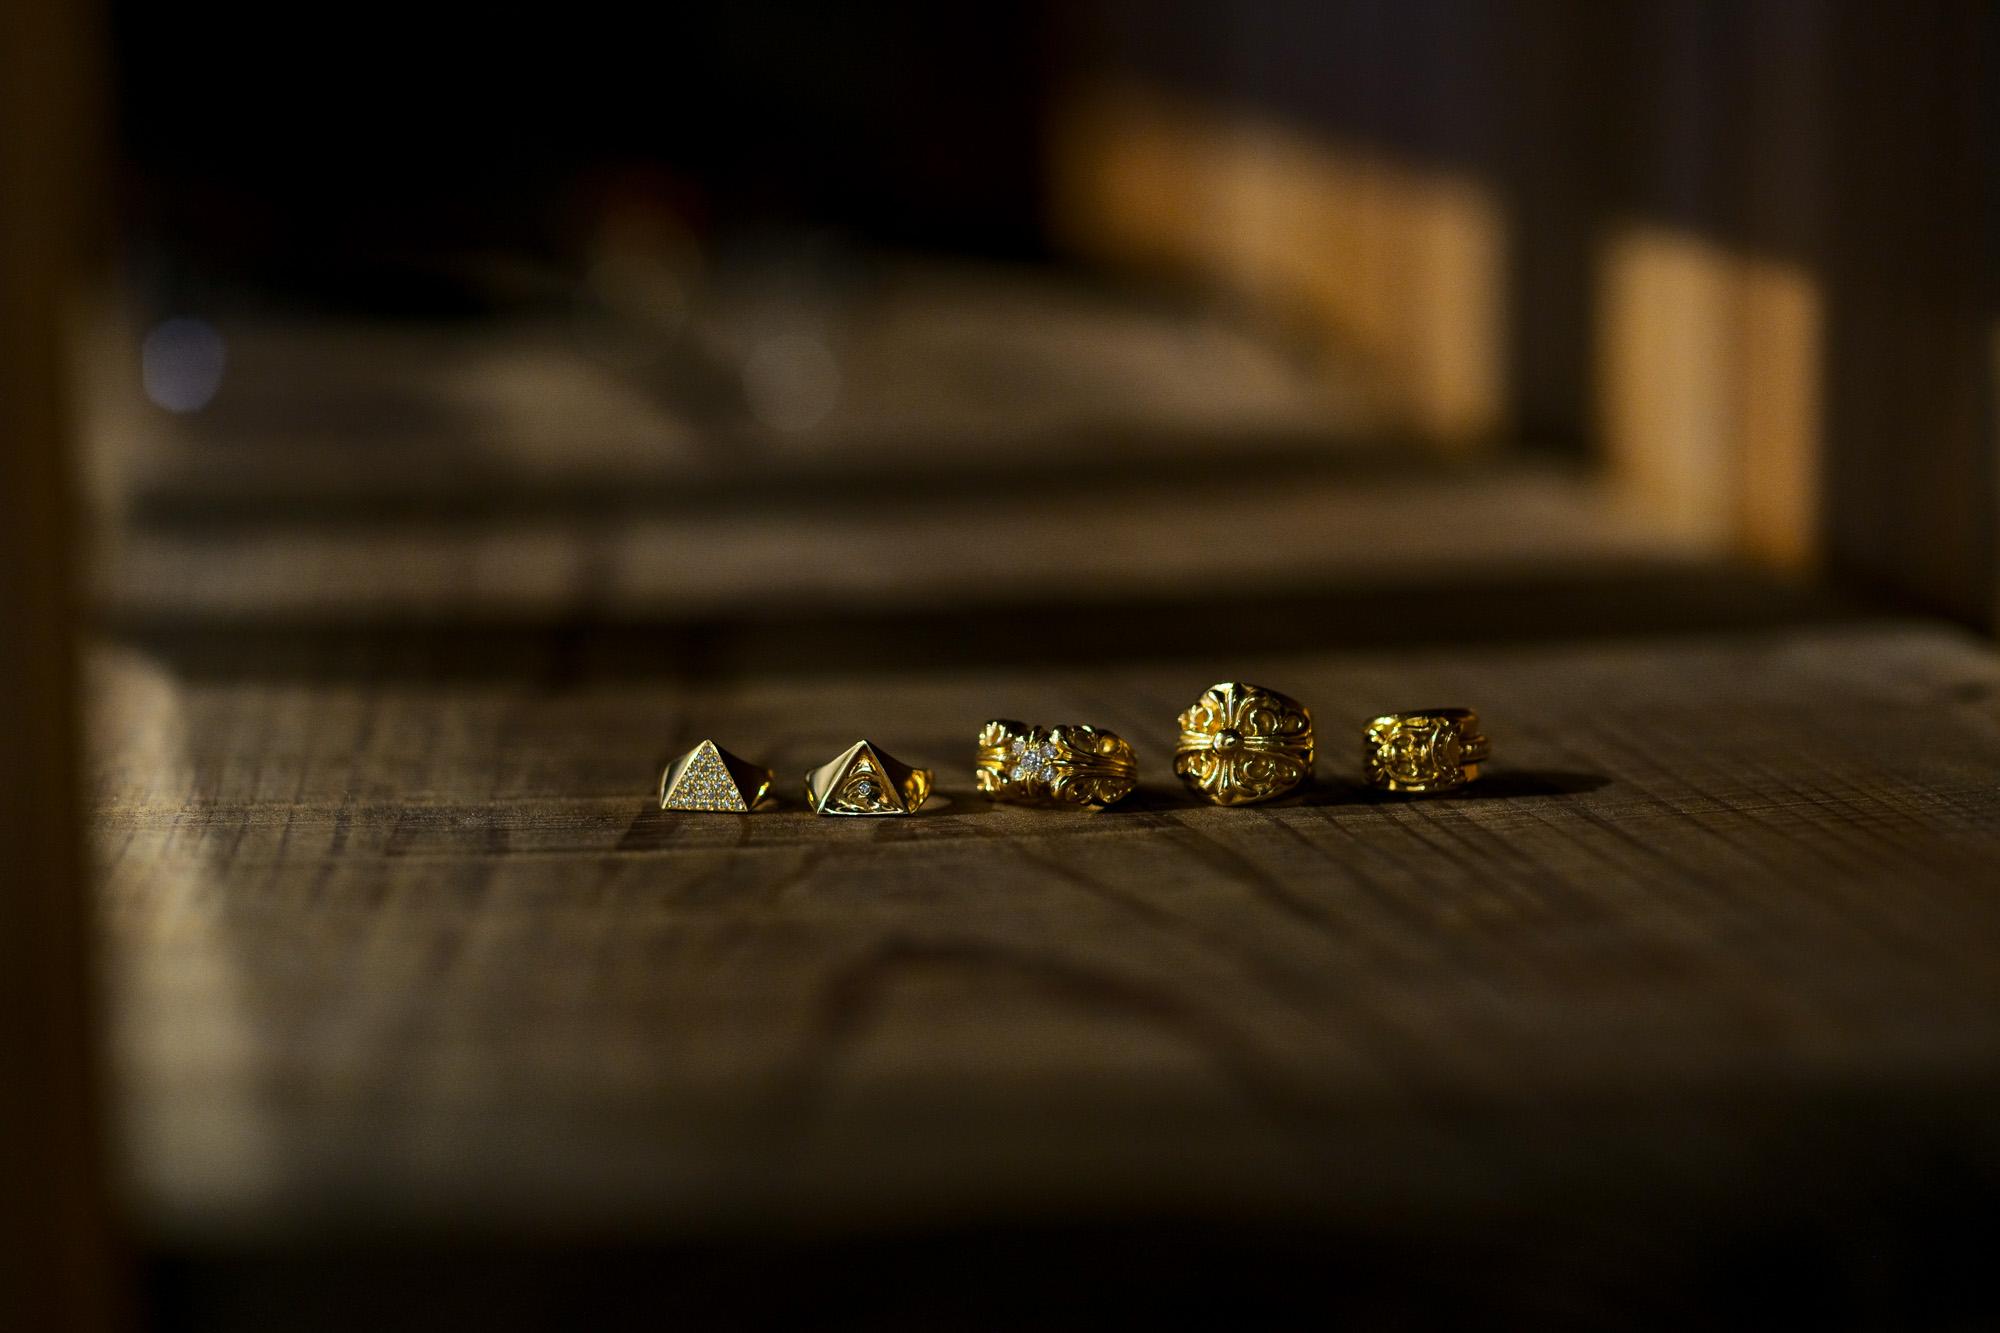 "FIXER ""ILLUMINATI EYES RING FULL PAVE WHITE DIAMOND 22K GOLD"" × FIXER ""ILLUMINATI EYES RING WHITE DIAMOND 22K GOLD SP"" × CHROME HEARTS ""K&T Ring 5 WHITE DIAMOND 22K"" × CHROME HEARTS ""Keeper Ring 22K"" × CHROME HEARTS ""DAGGER RING 22K"" フィクサー イルミナティ アイズリング 22Kゴールド クロムハーツ KTリング キーパーリング ダガーリング 22金 愛知 名古屋 Alto e Diritto アルトエデリット"